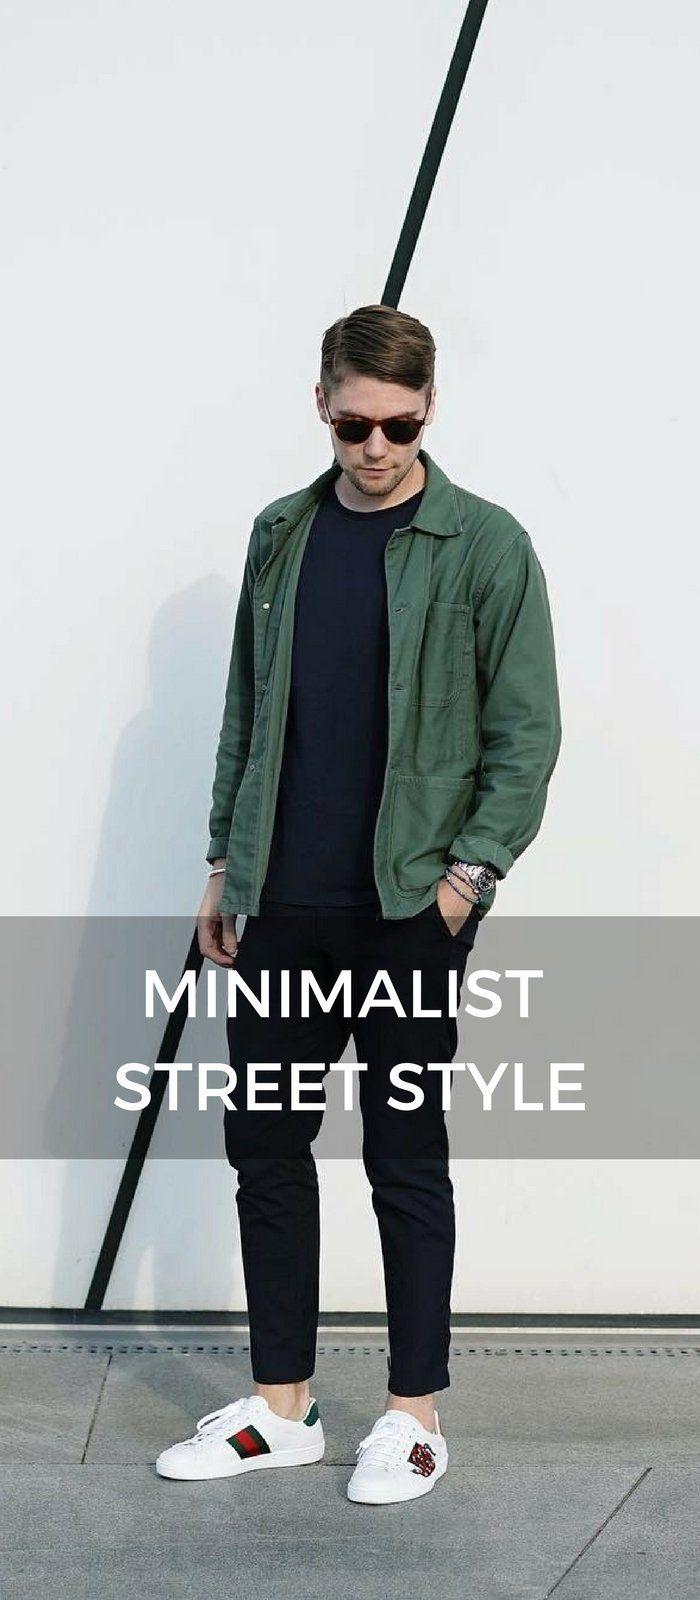 15 winter looks for minimalist fashion style chic avant garde pinterest moda. Black Bedroom Furniture Sets. Home Design Ideas